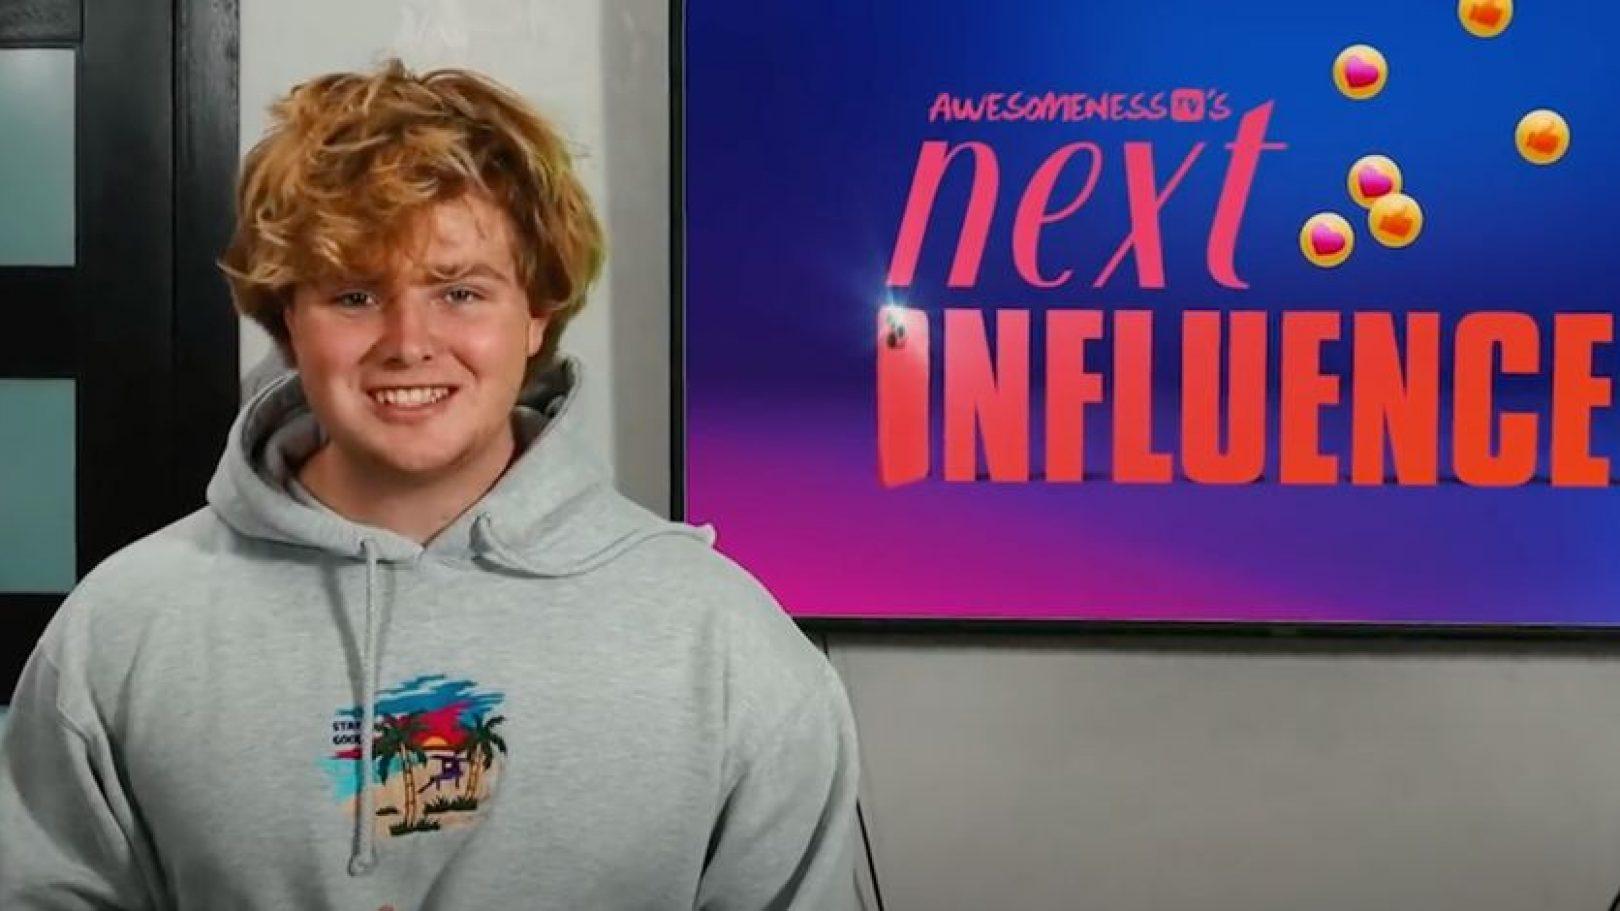 AwesomenessTV's Next Influencer